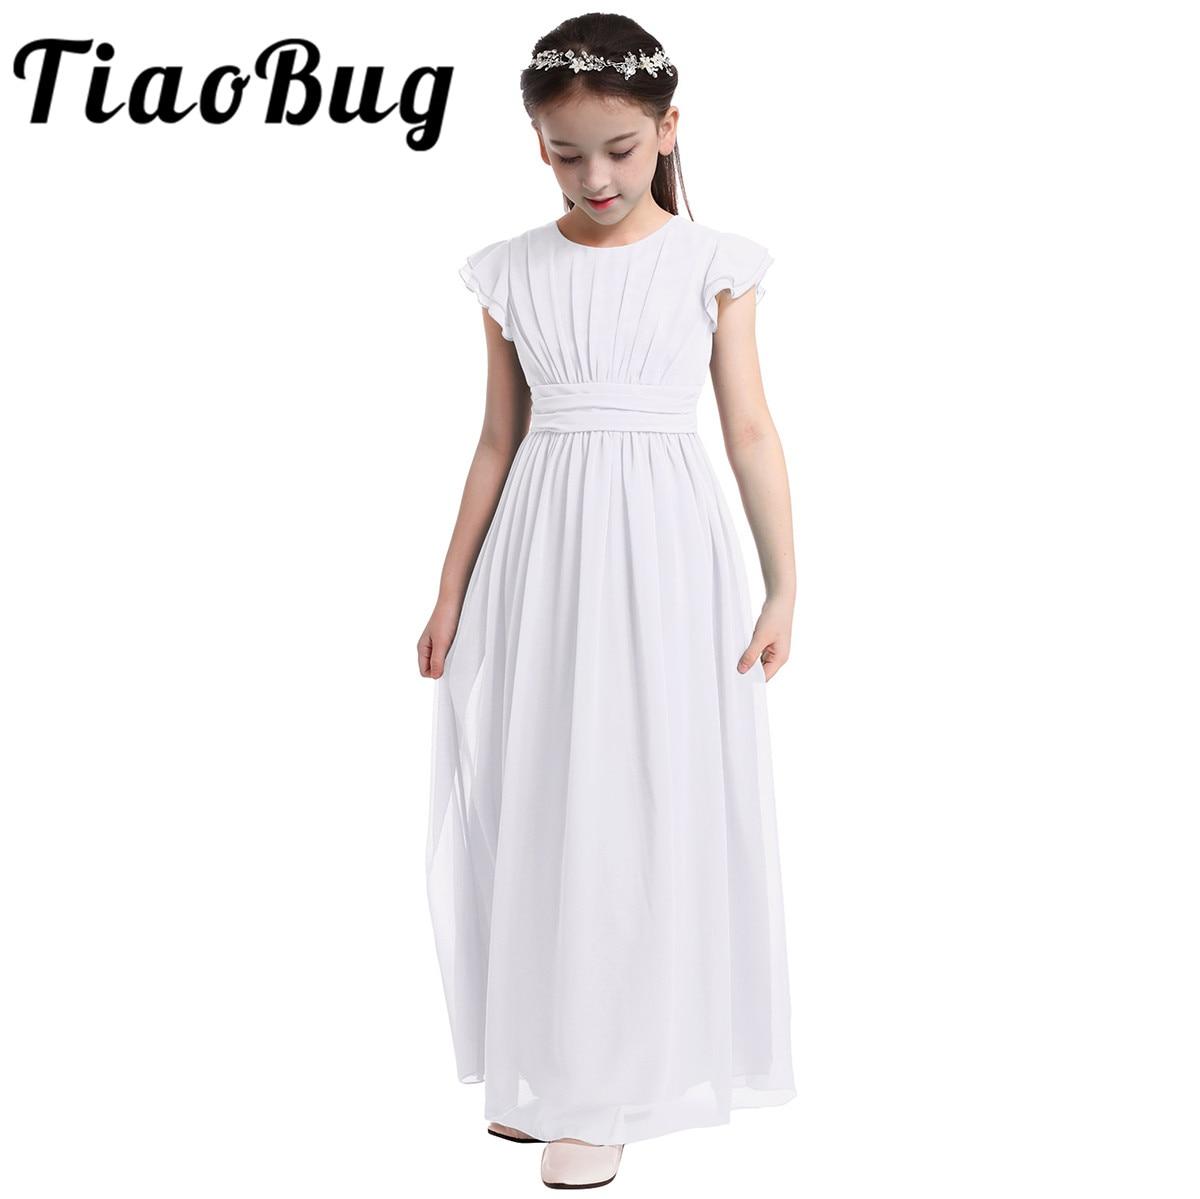 Girls Chiffon Flutter Sleeves Flower Girl Dress Pleated High waisted Princess Pageant Birthday Wedding Party Long Dress SZ 4 14Flower Girl Dresses   -